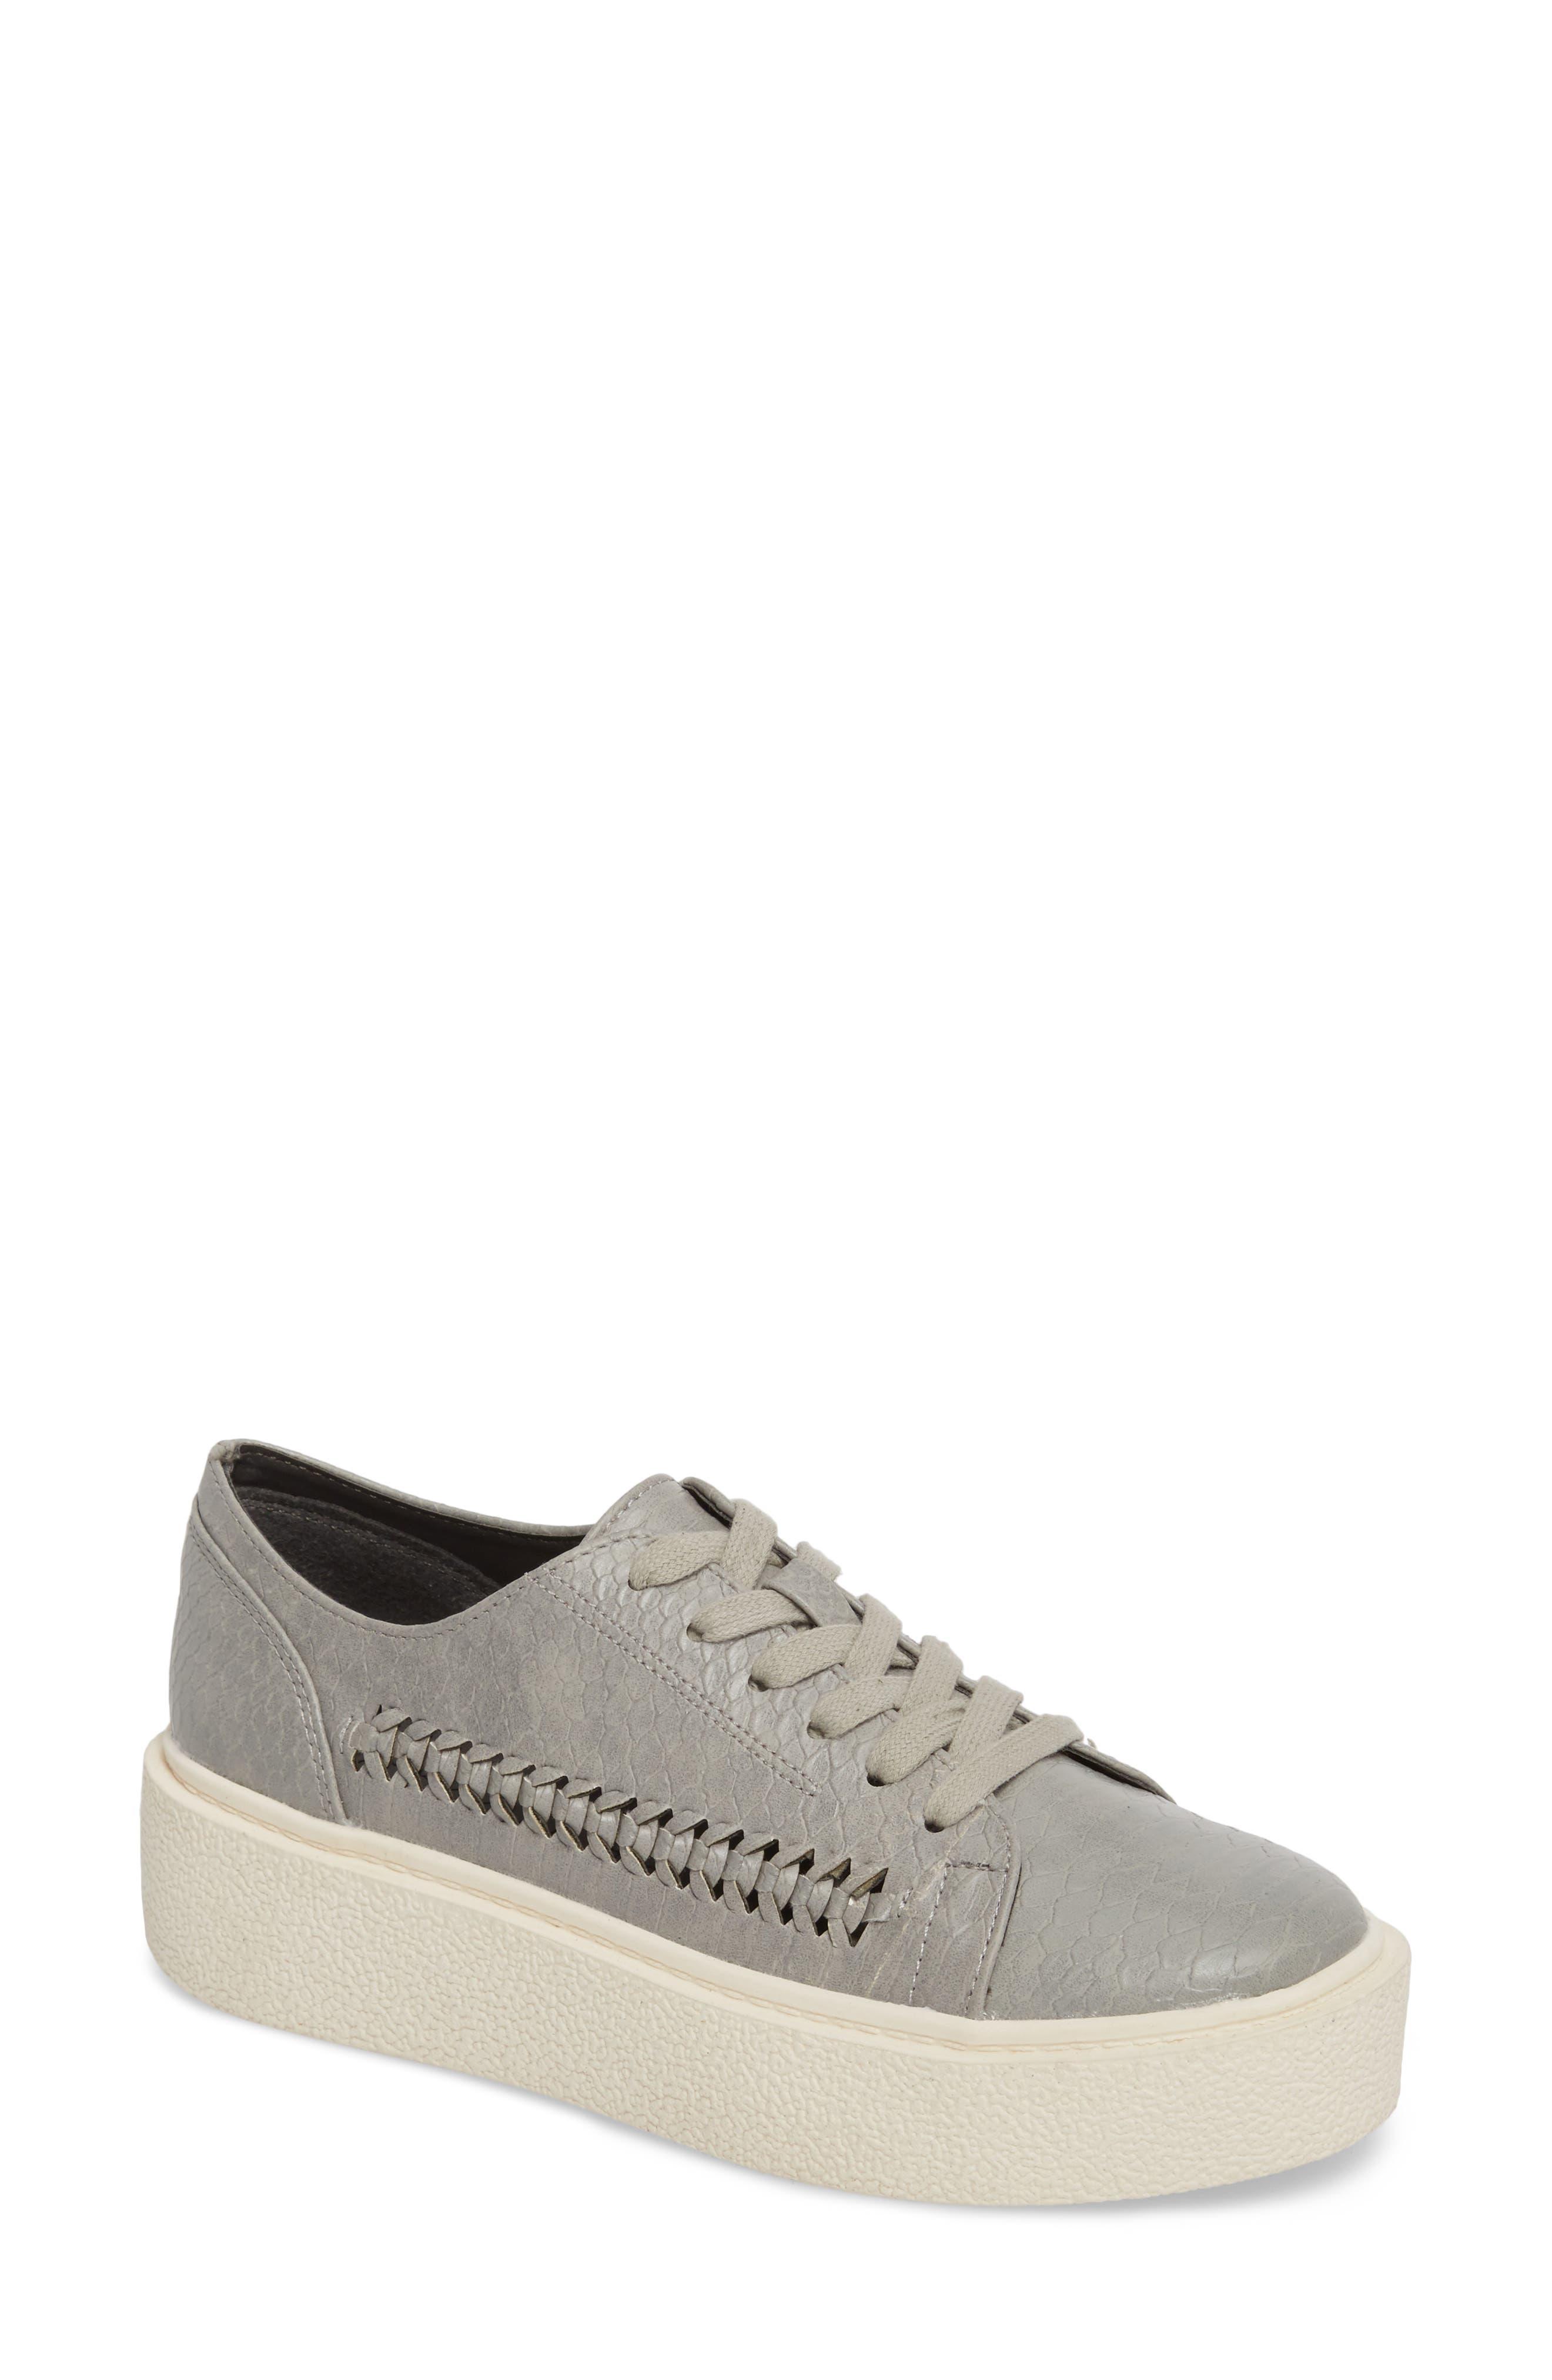 White Out Platform Sneaker,                             Main thumbnail 1, color,                             037